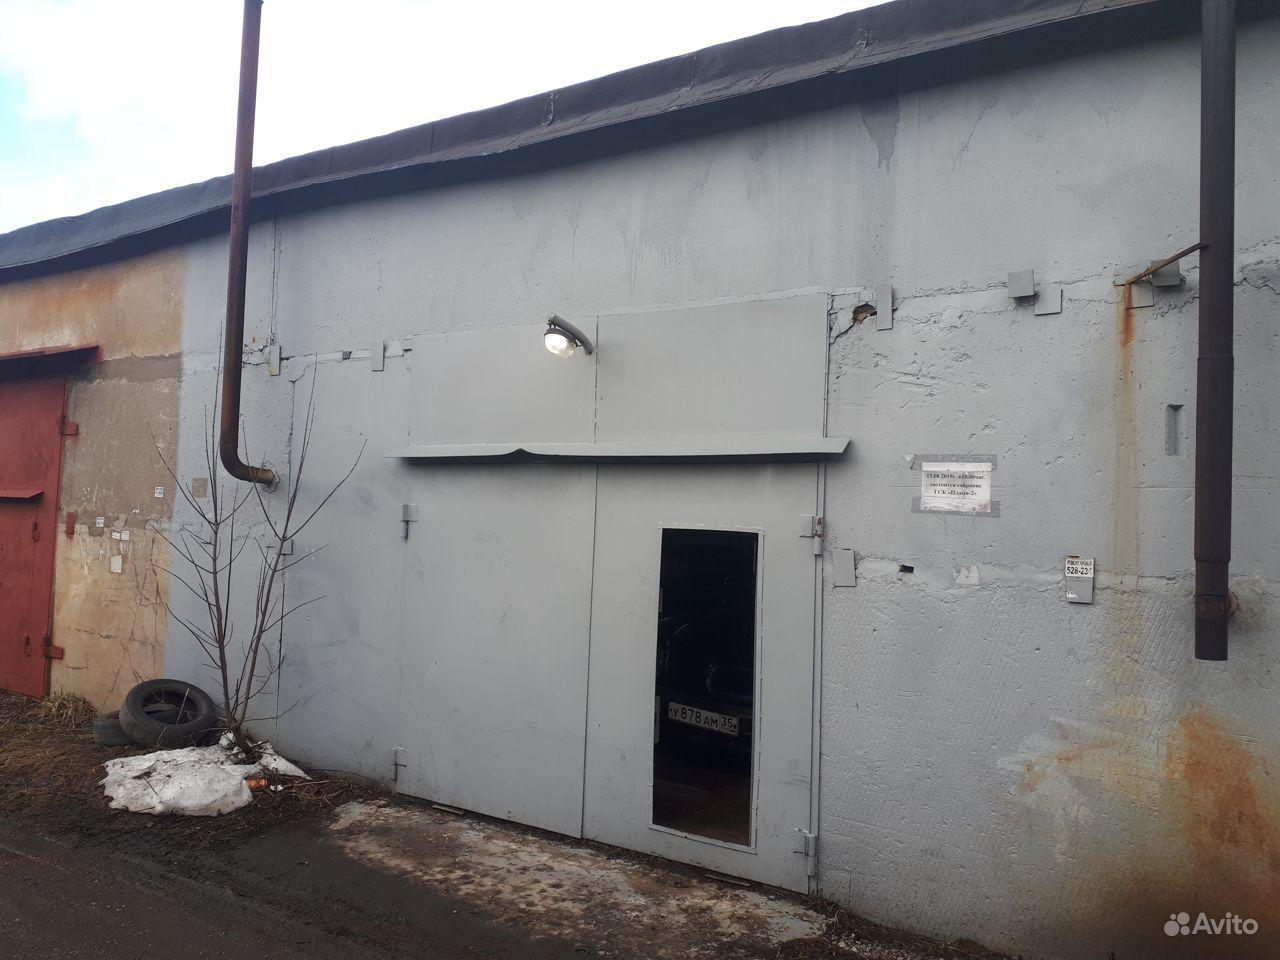 Недвижимость Гаражи и машиноместа / Гараж, > 30 м²